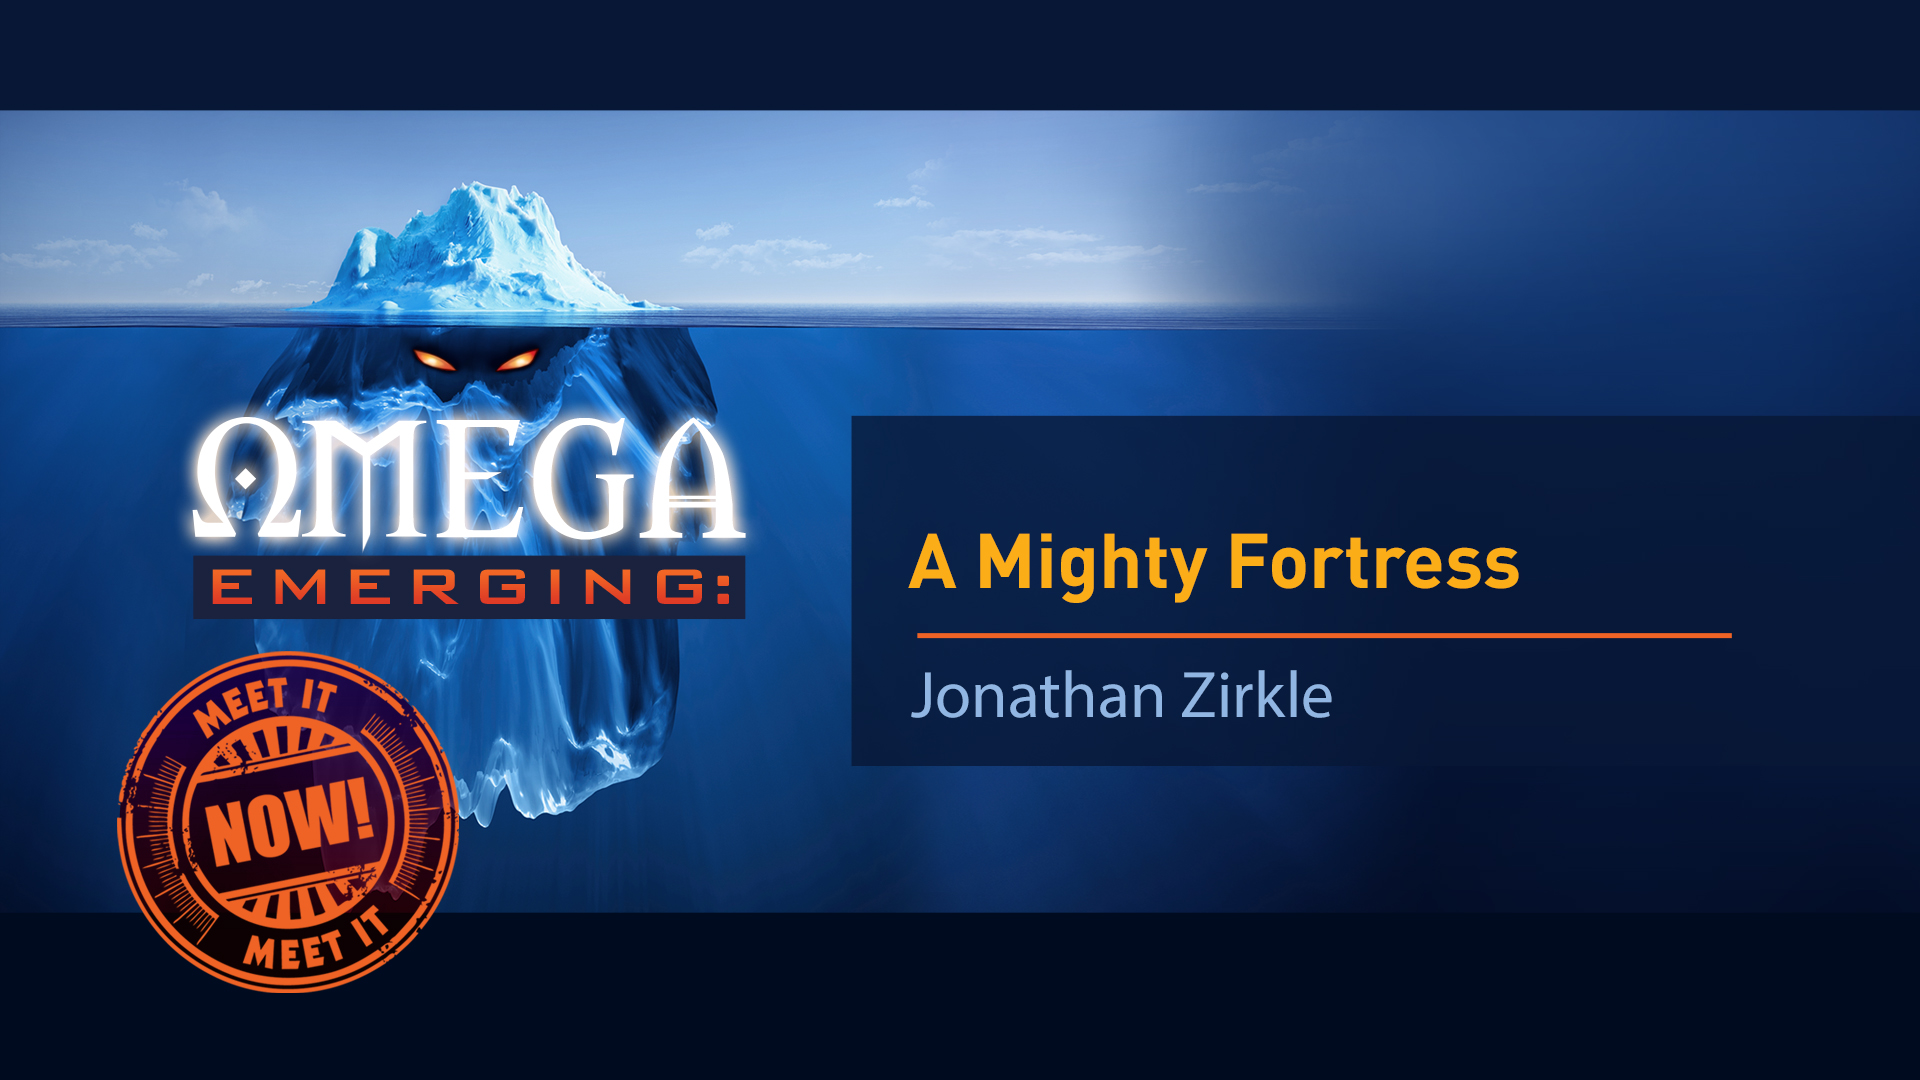 5. A Mighty Fortress - Jonathan Zirkle